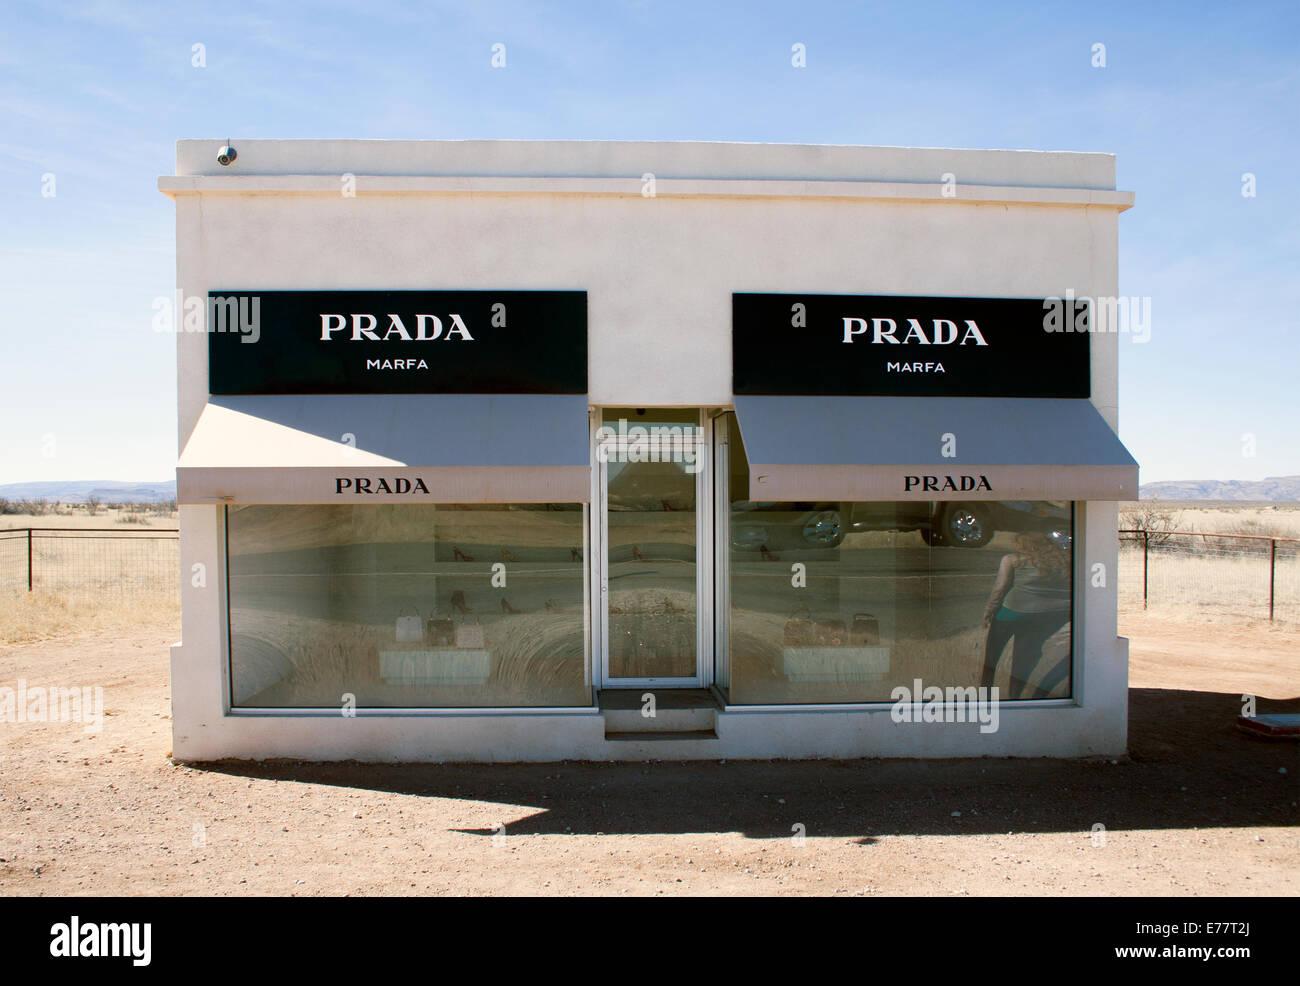 Prada store art installation in the desert in Valentine Texas - Stock Image